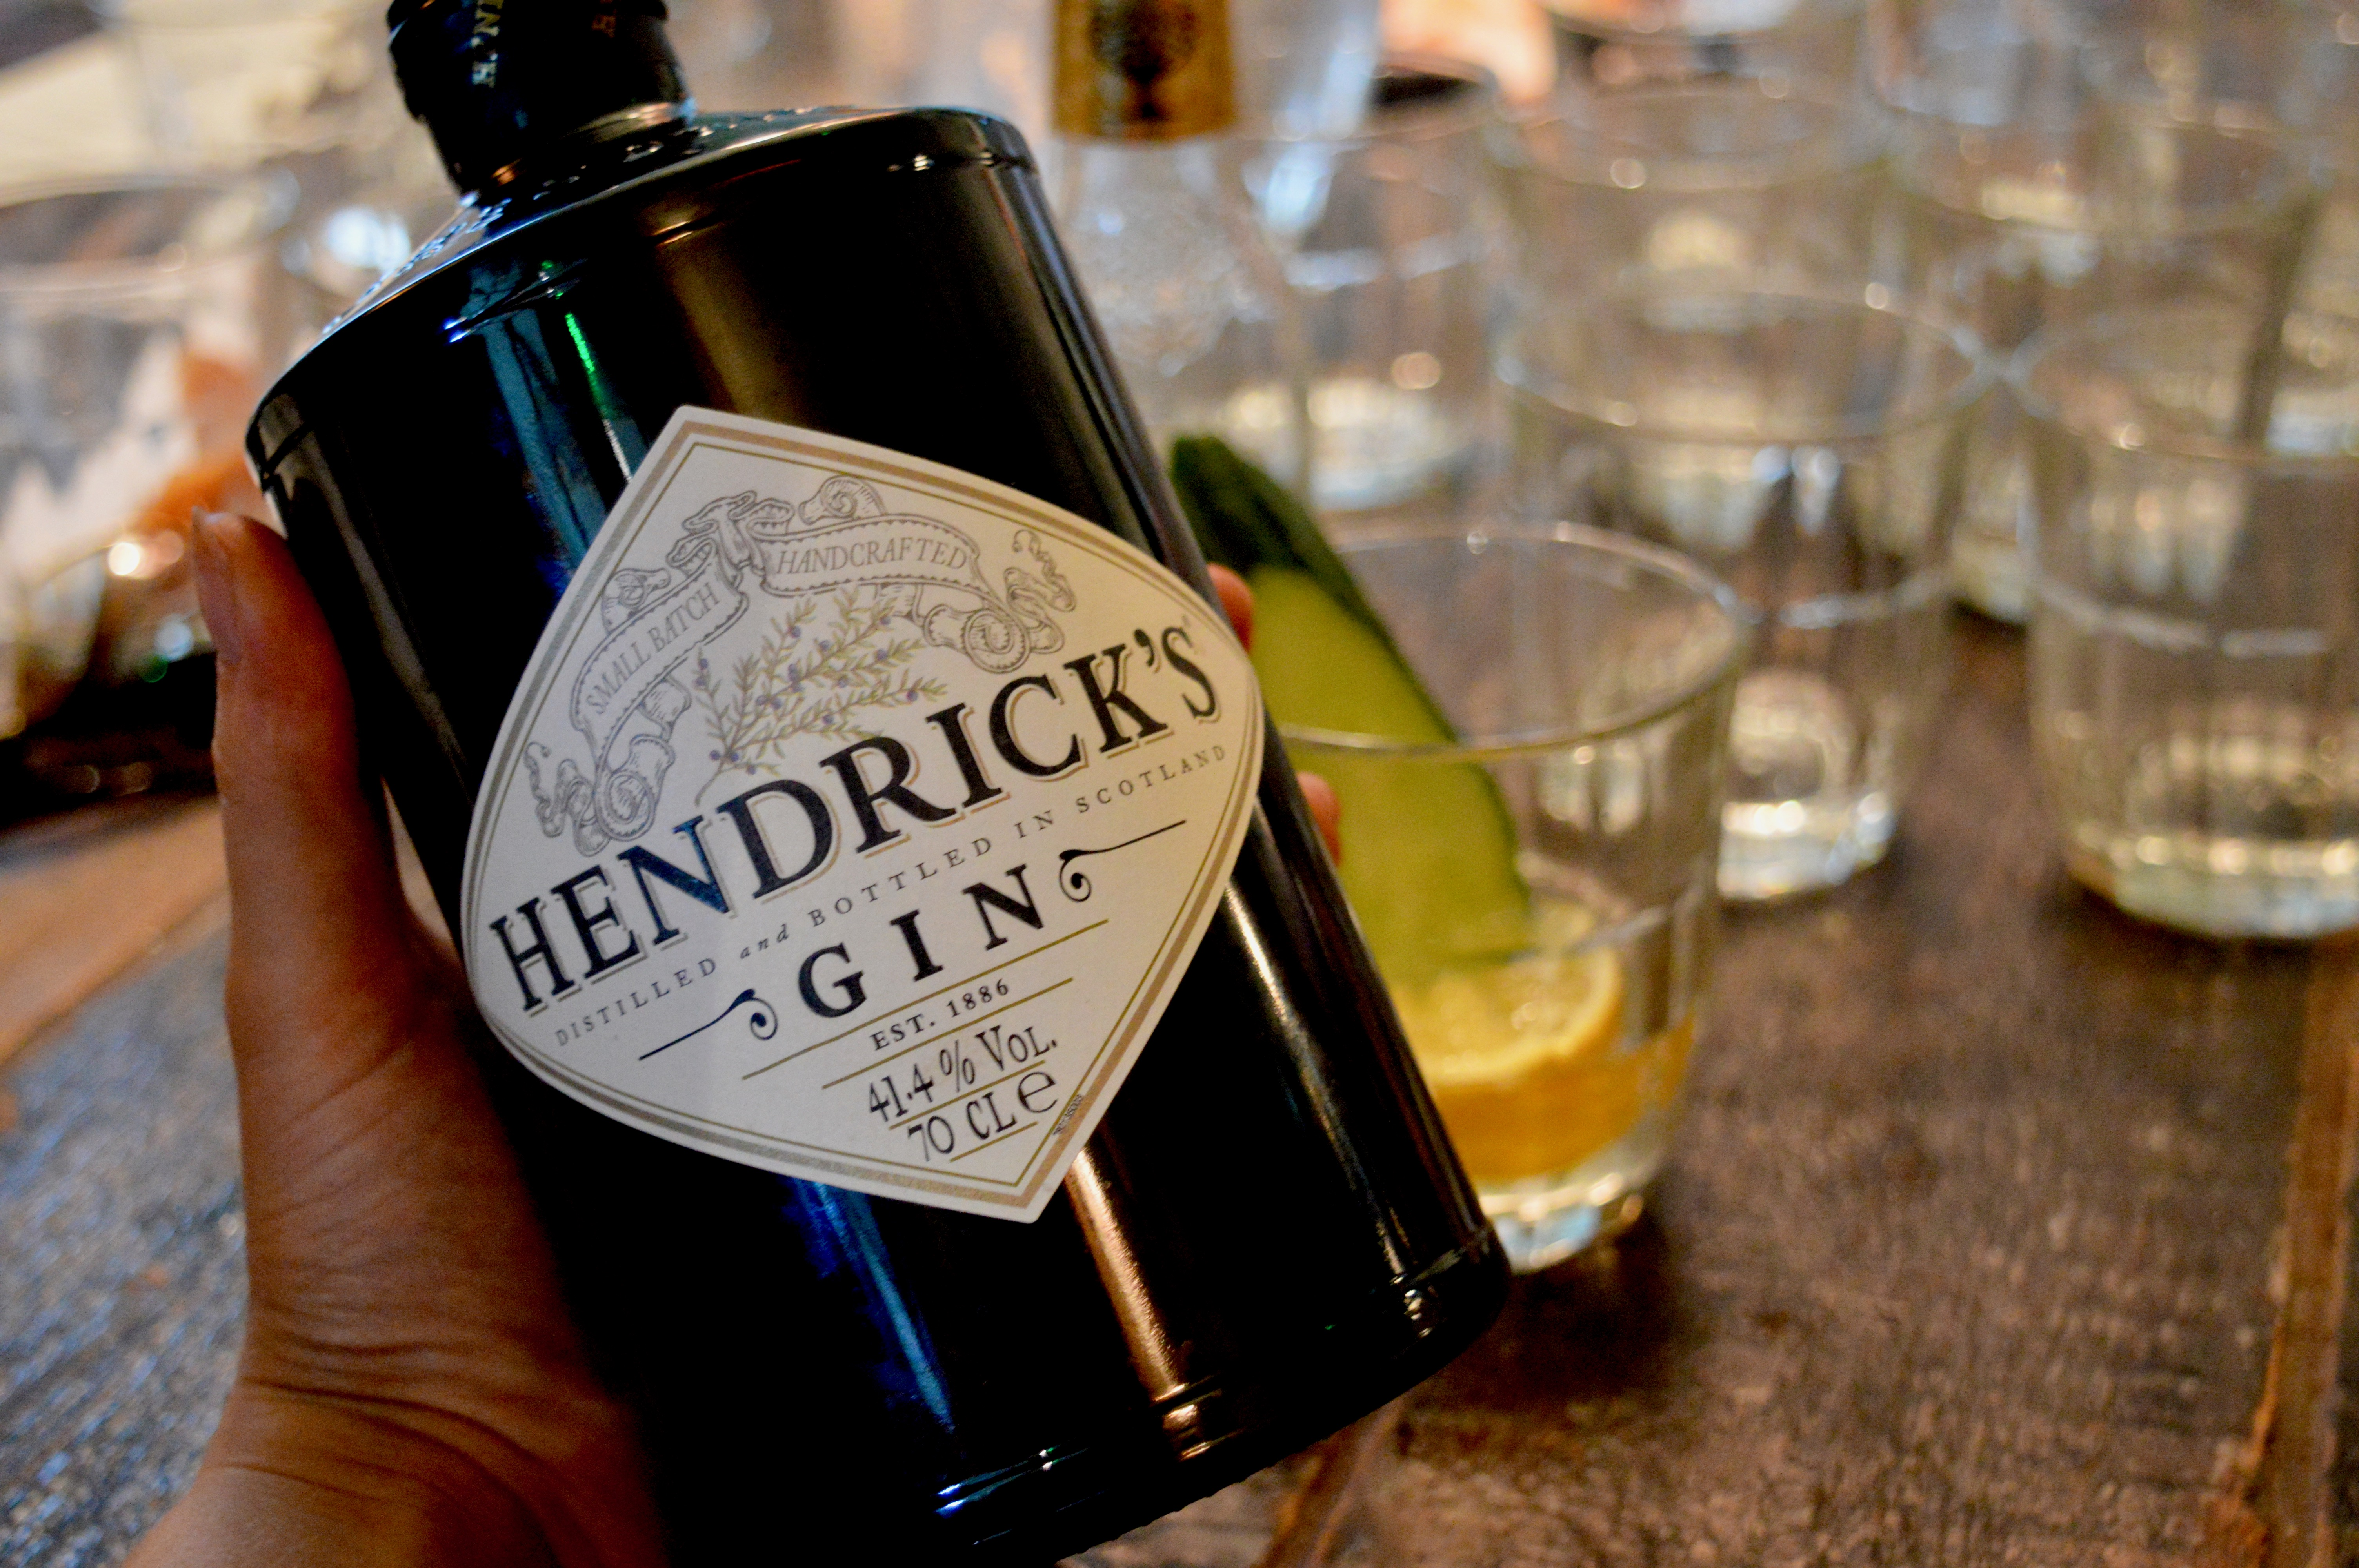 hendricks-gin-masterclass-botanist-newcastle-elle-blonde-luxury-lifestyle-destination-blog